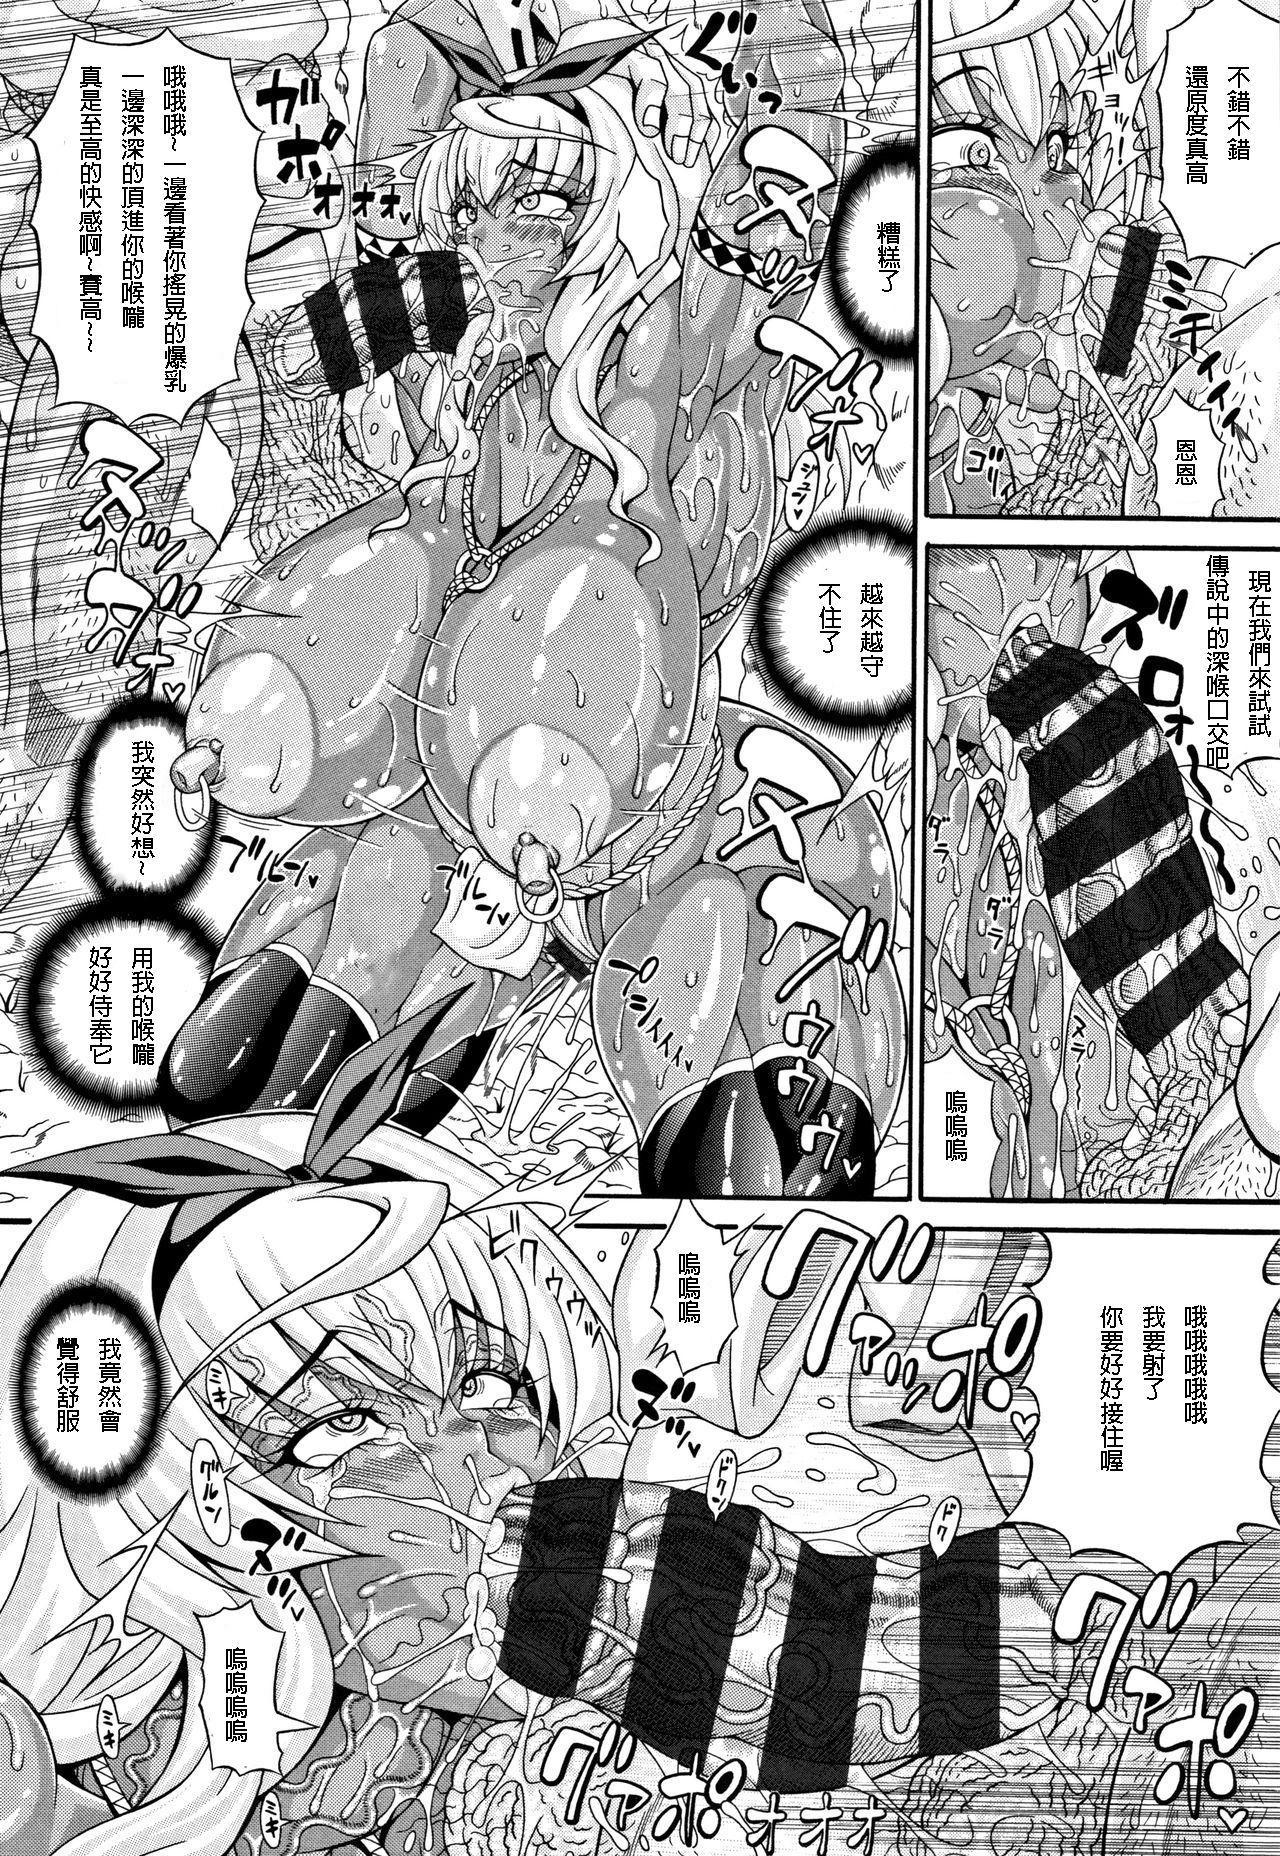 Mahoutsukai Musou 5